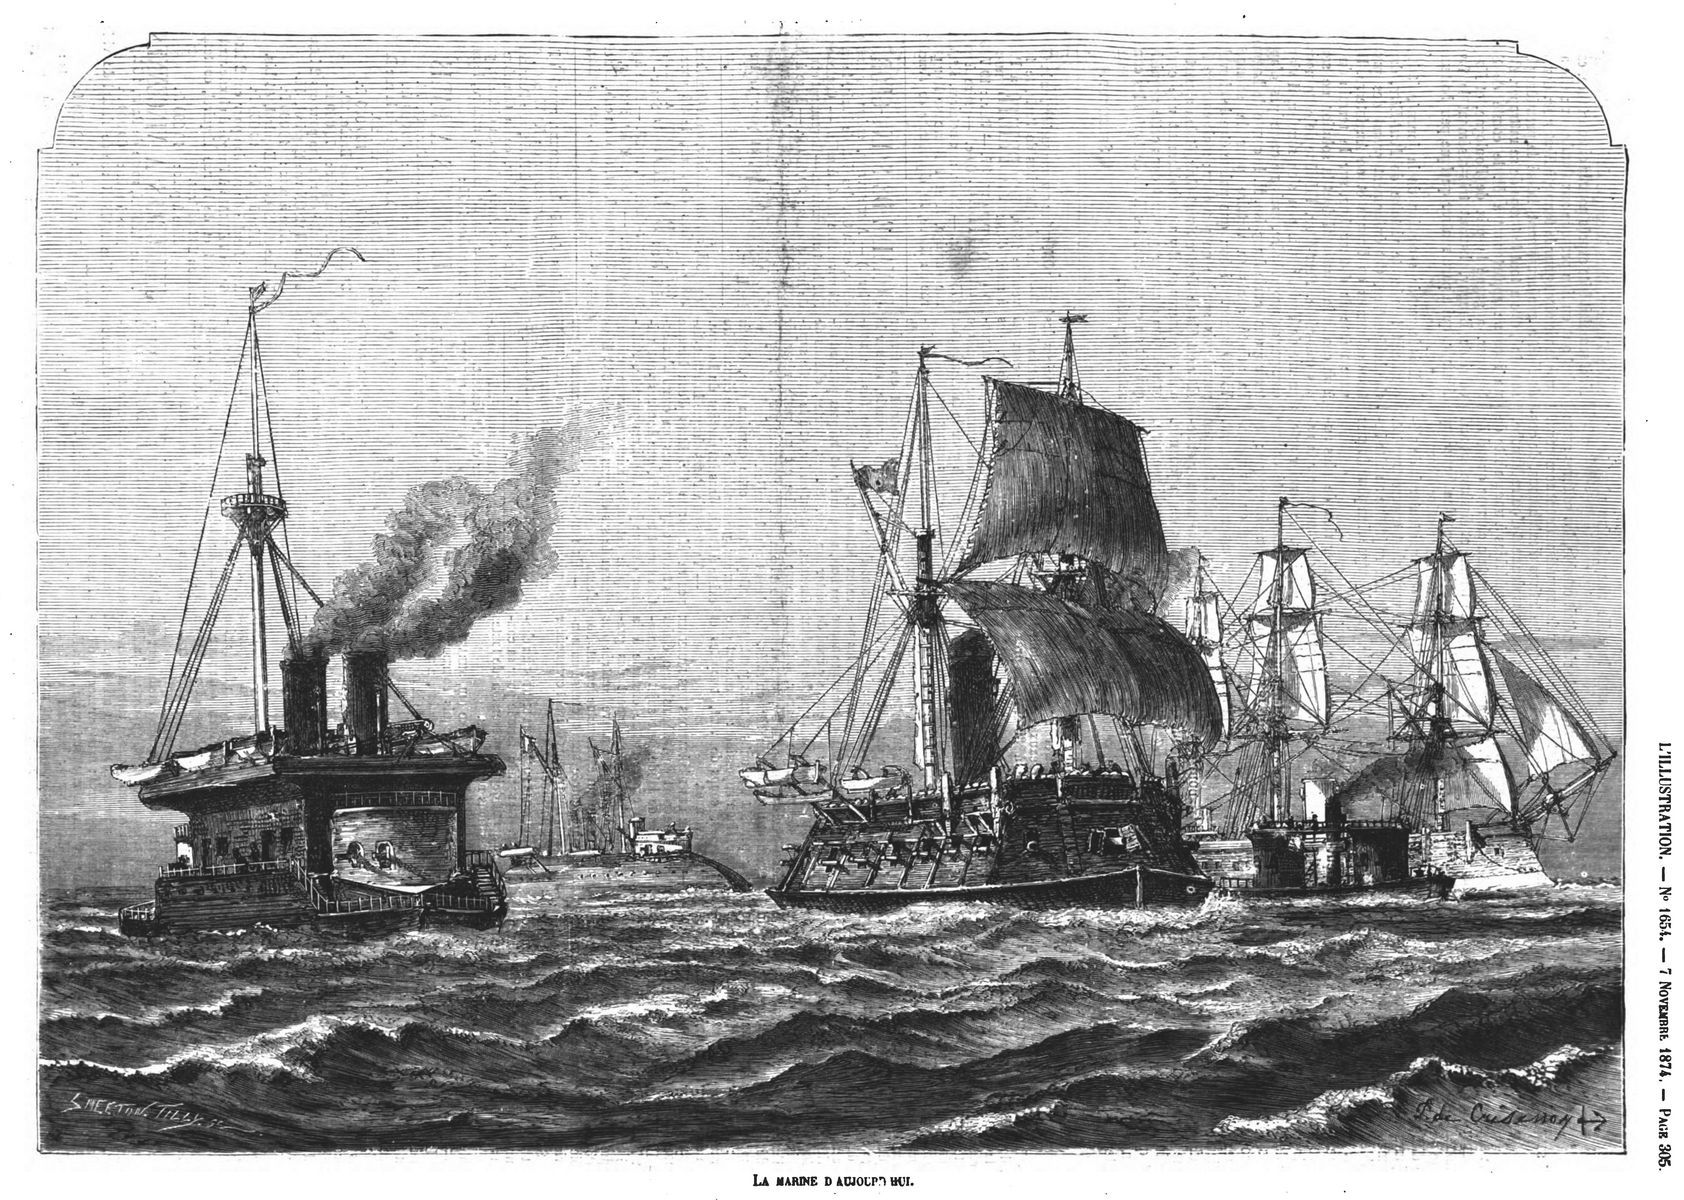 La marine d'aujourd'hui. Gravure 1874